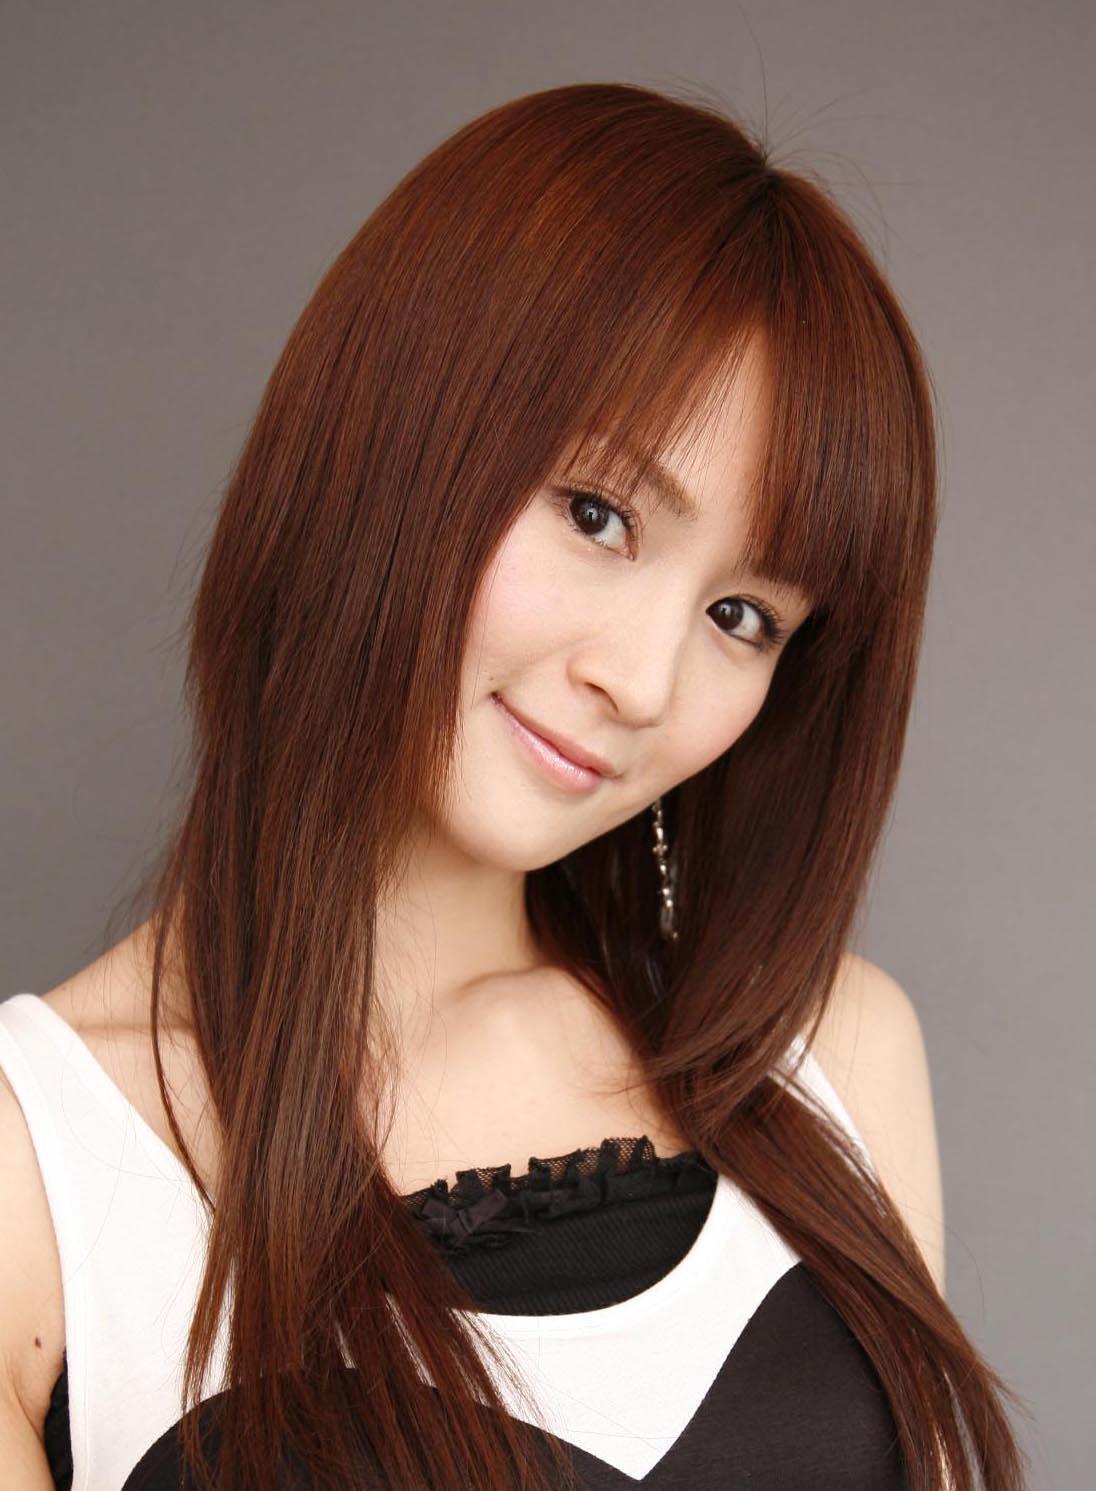 is the voice actor yu kobayashi possibly sick beautys face o109614911275477611032.jpg?resize=1200,630 - 声優・小林ゆうはもしかして病気なの?美人の顔の裏側に迫る!